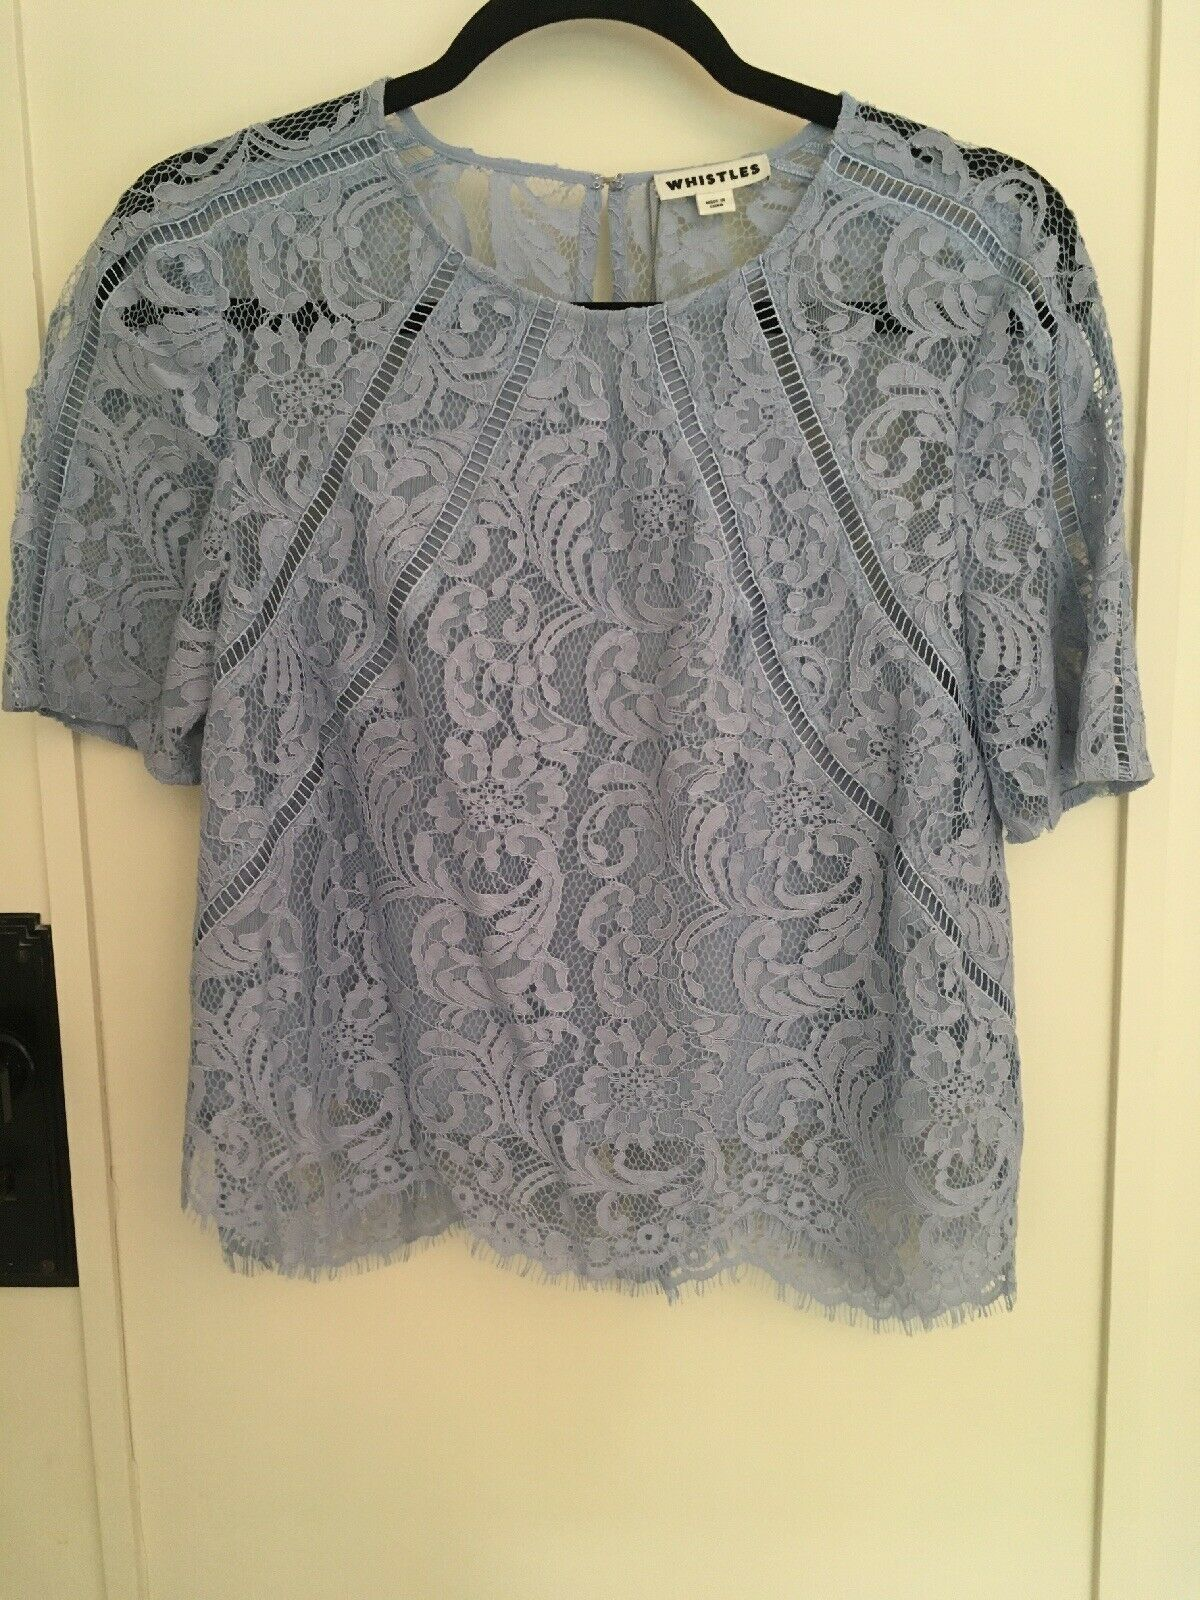 Whistles Lace Top Größe 10 Bnwt RRP+, Powder Blau